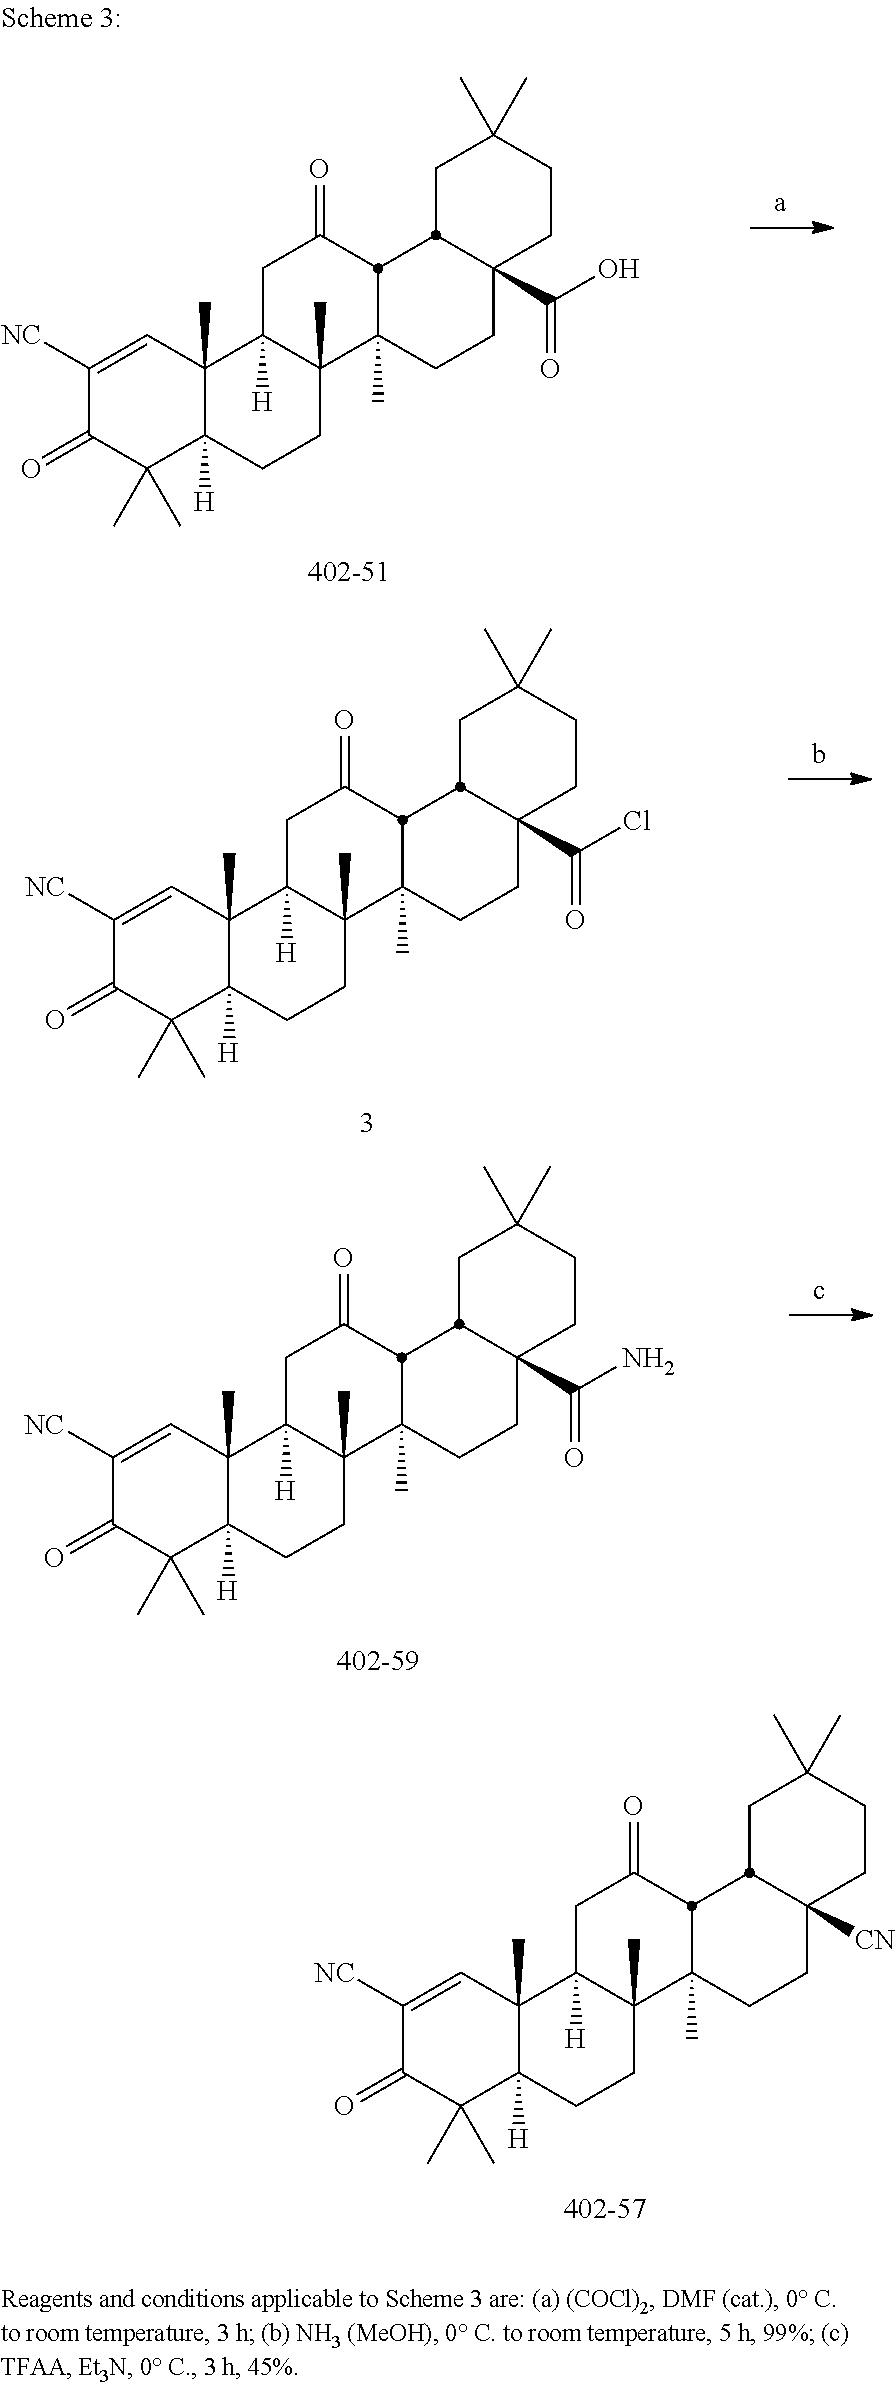 us8440820b2 antioxidant inflammation modulators oleanolic acid Asco 7000 Series Automatic Transfer Switch Installed figure us08440820 20130514 c00055